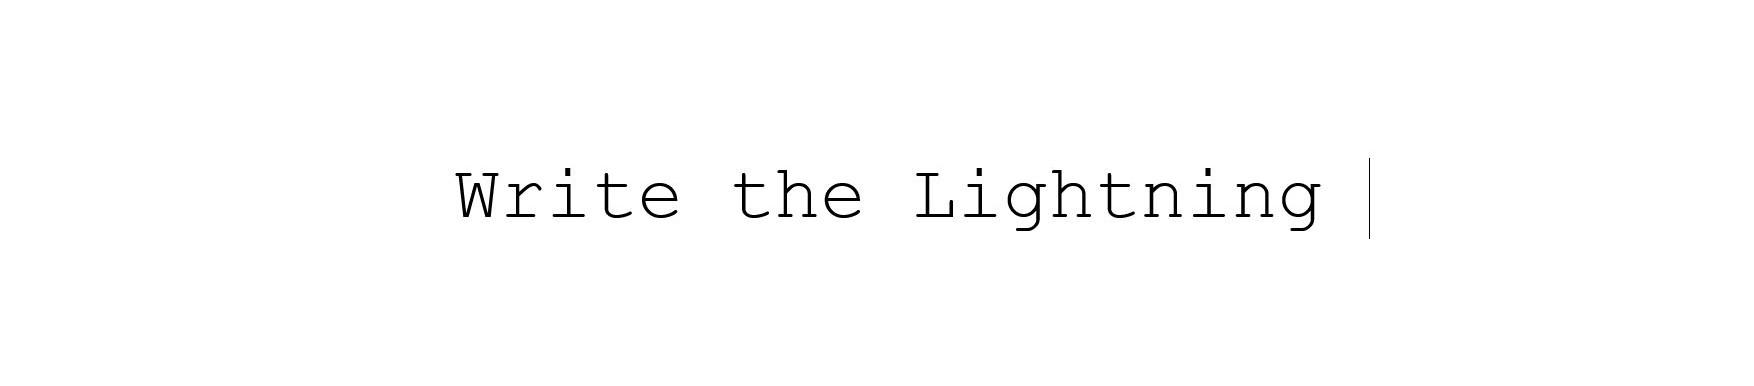 Write the Lightning |